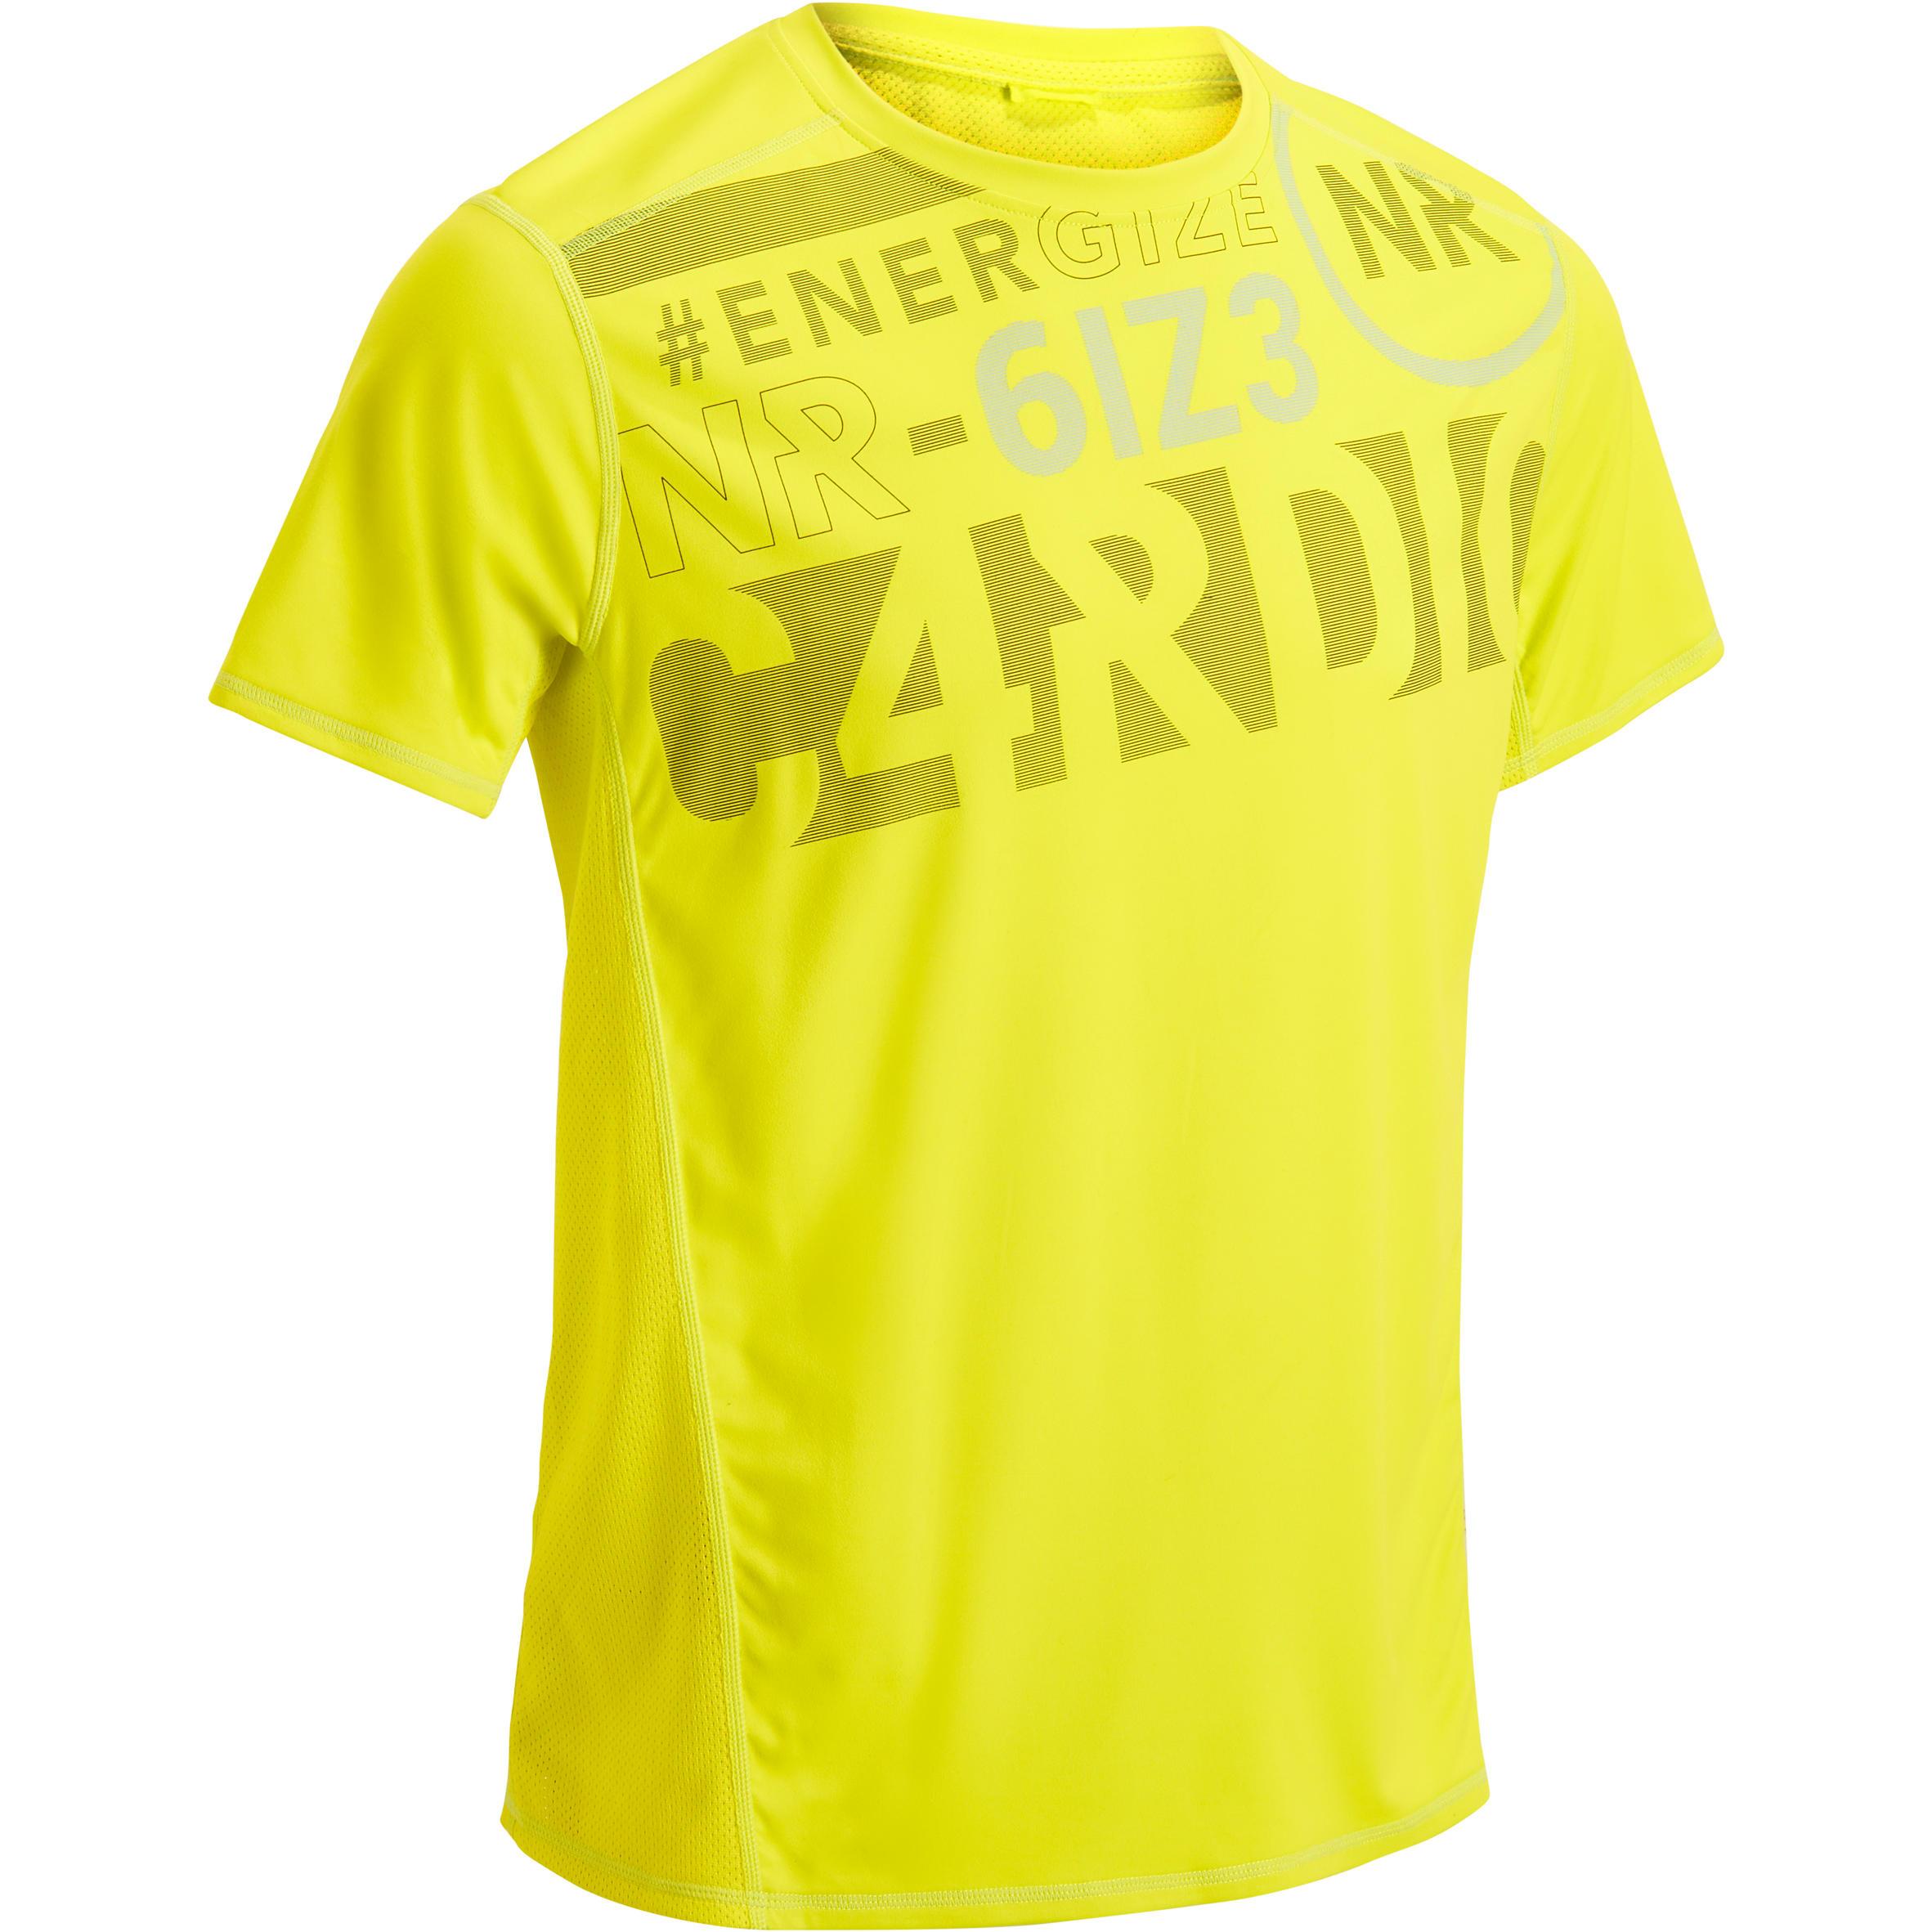 Cardio Fitness T-Shirt -